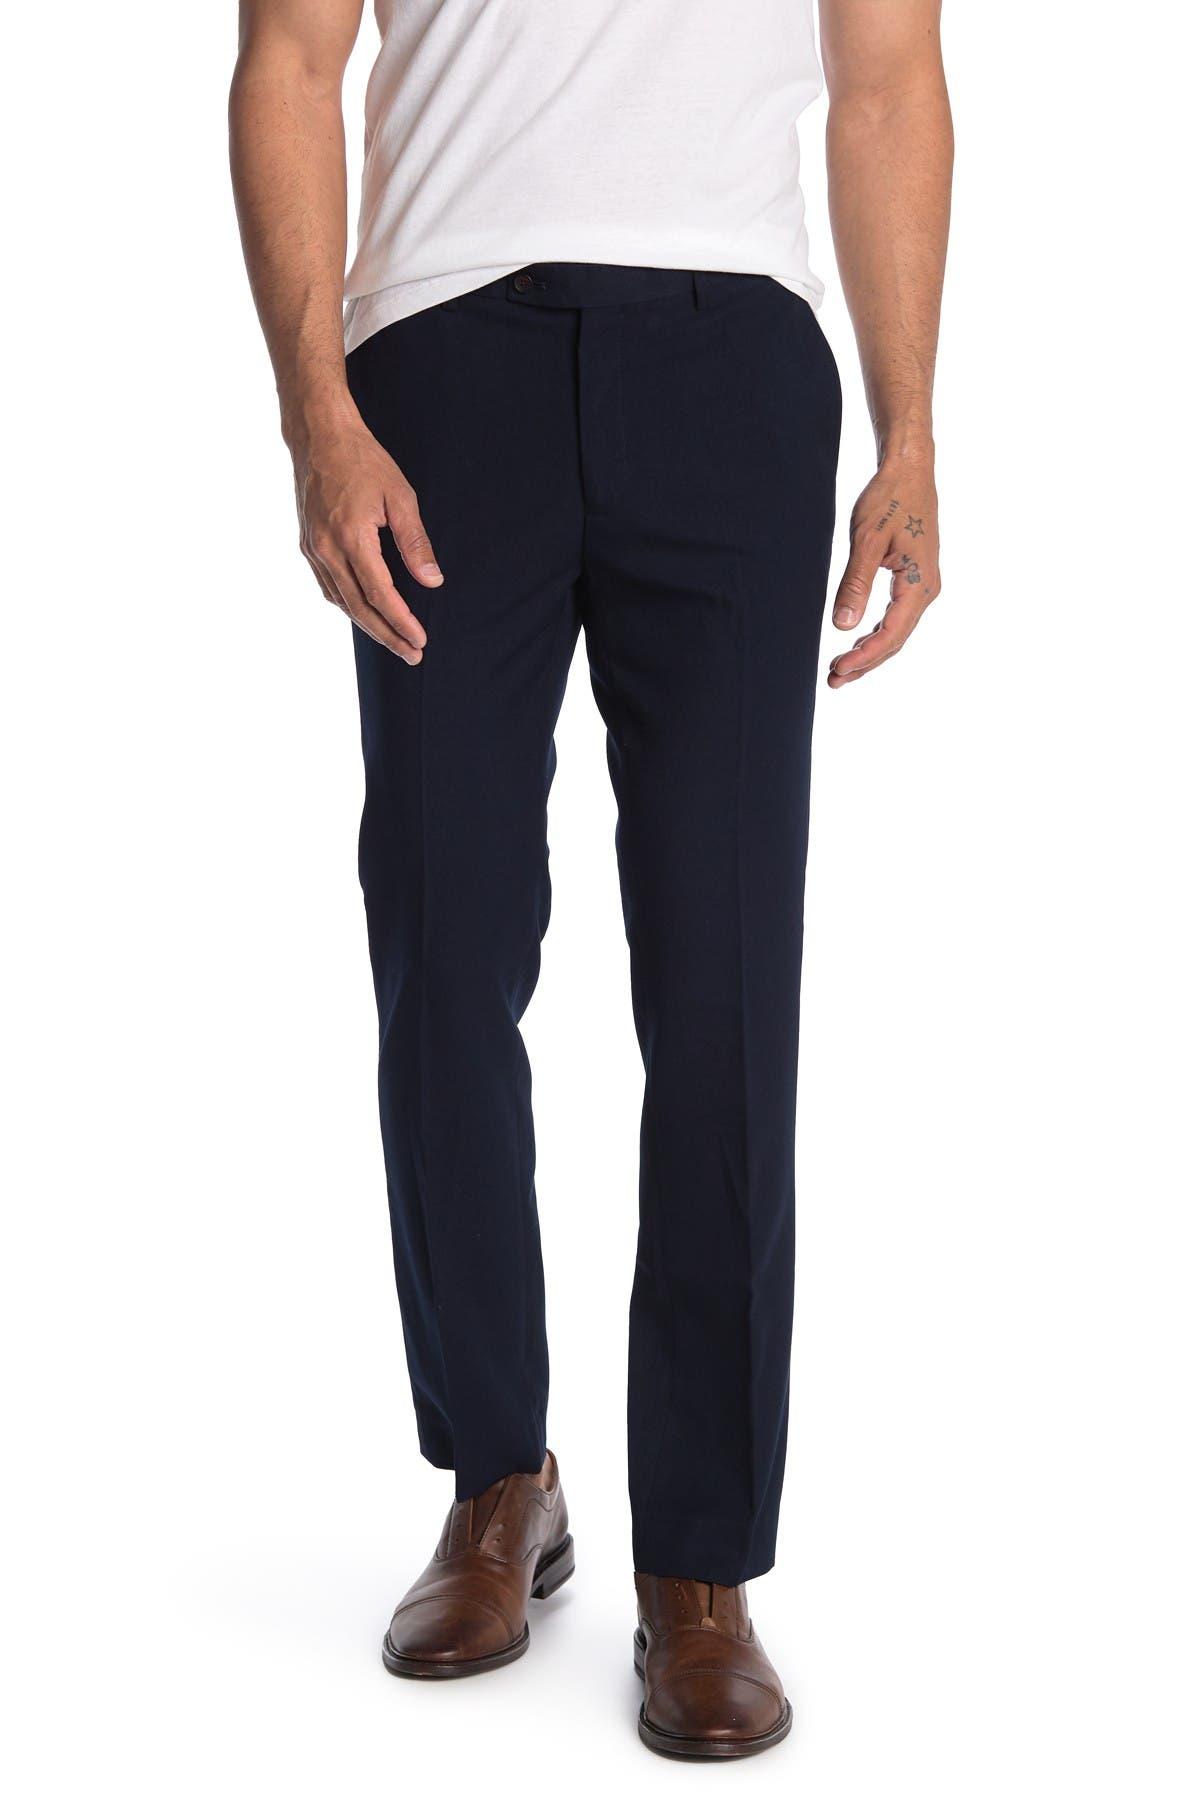 Image of Paisley & Gray Downing Slim Leg Pants